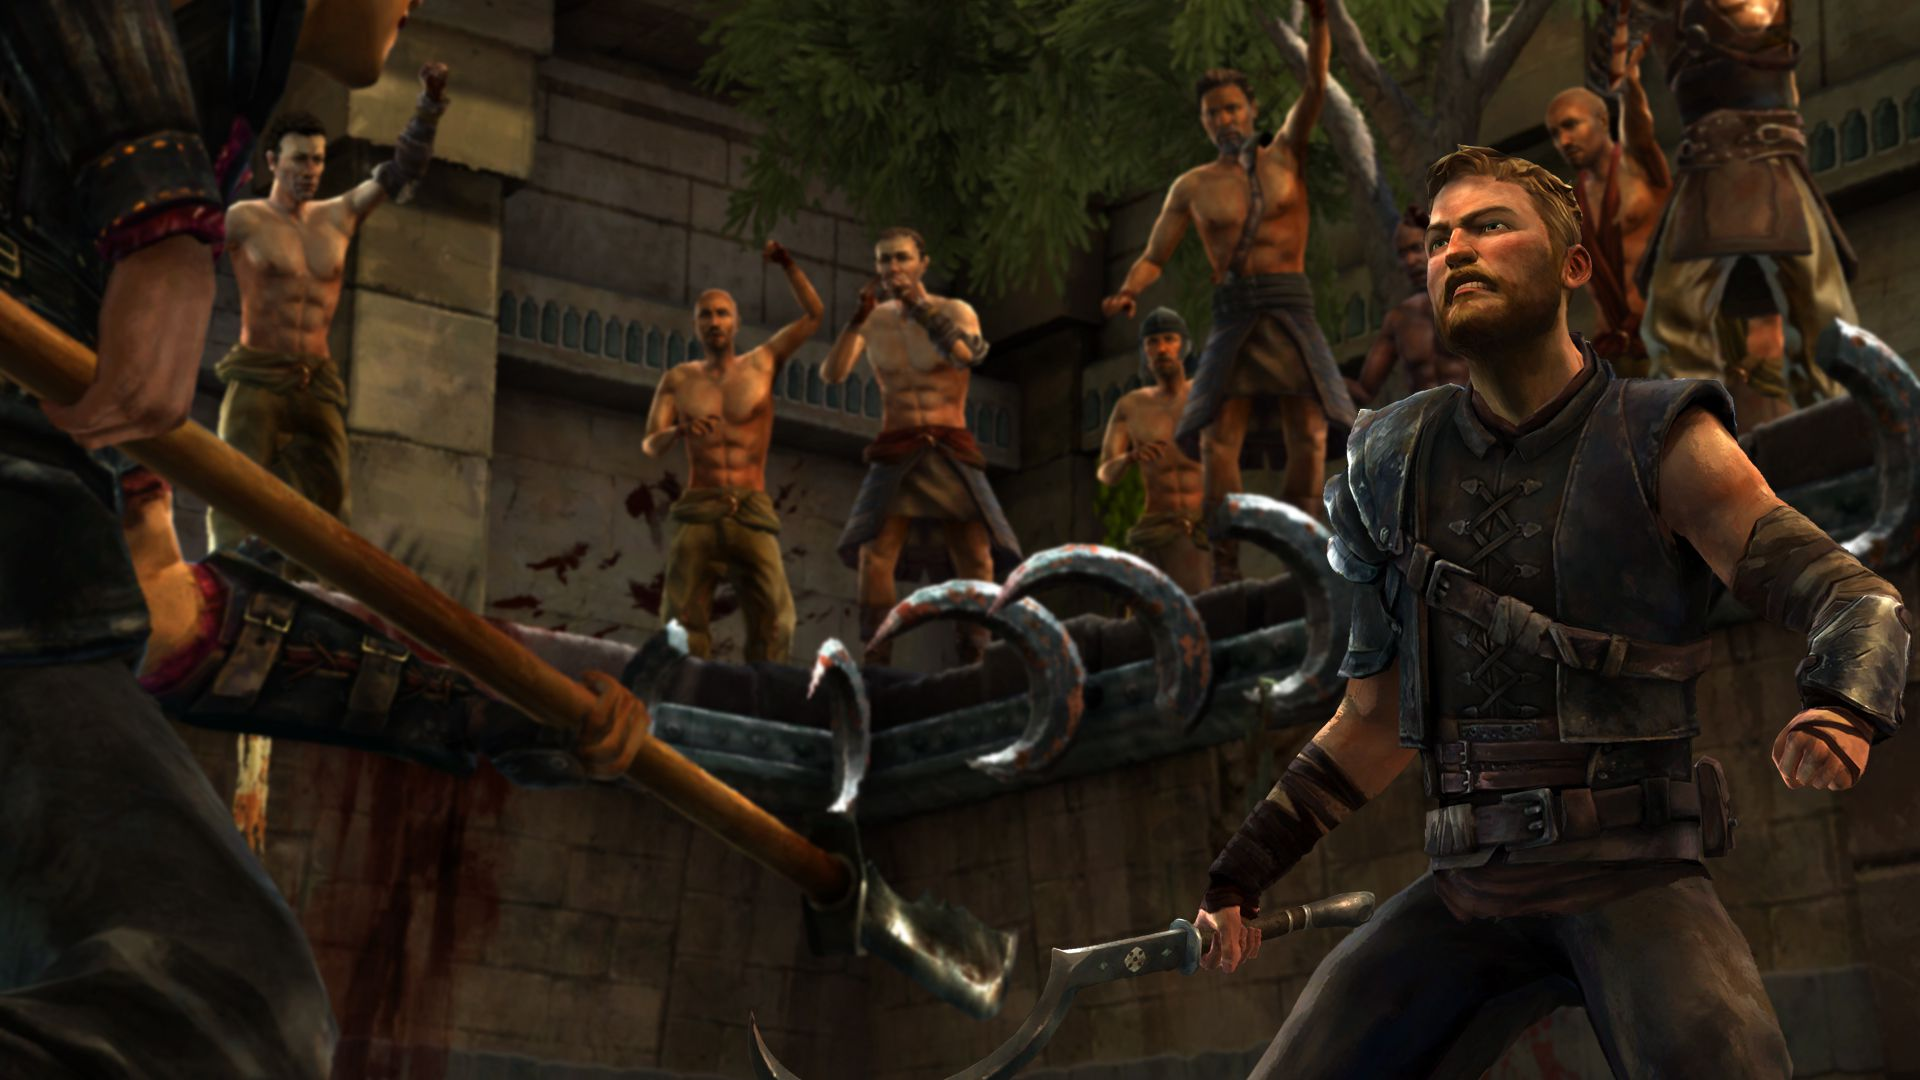 Game of Thrones: A Telltale Games Series Captura 1